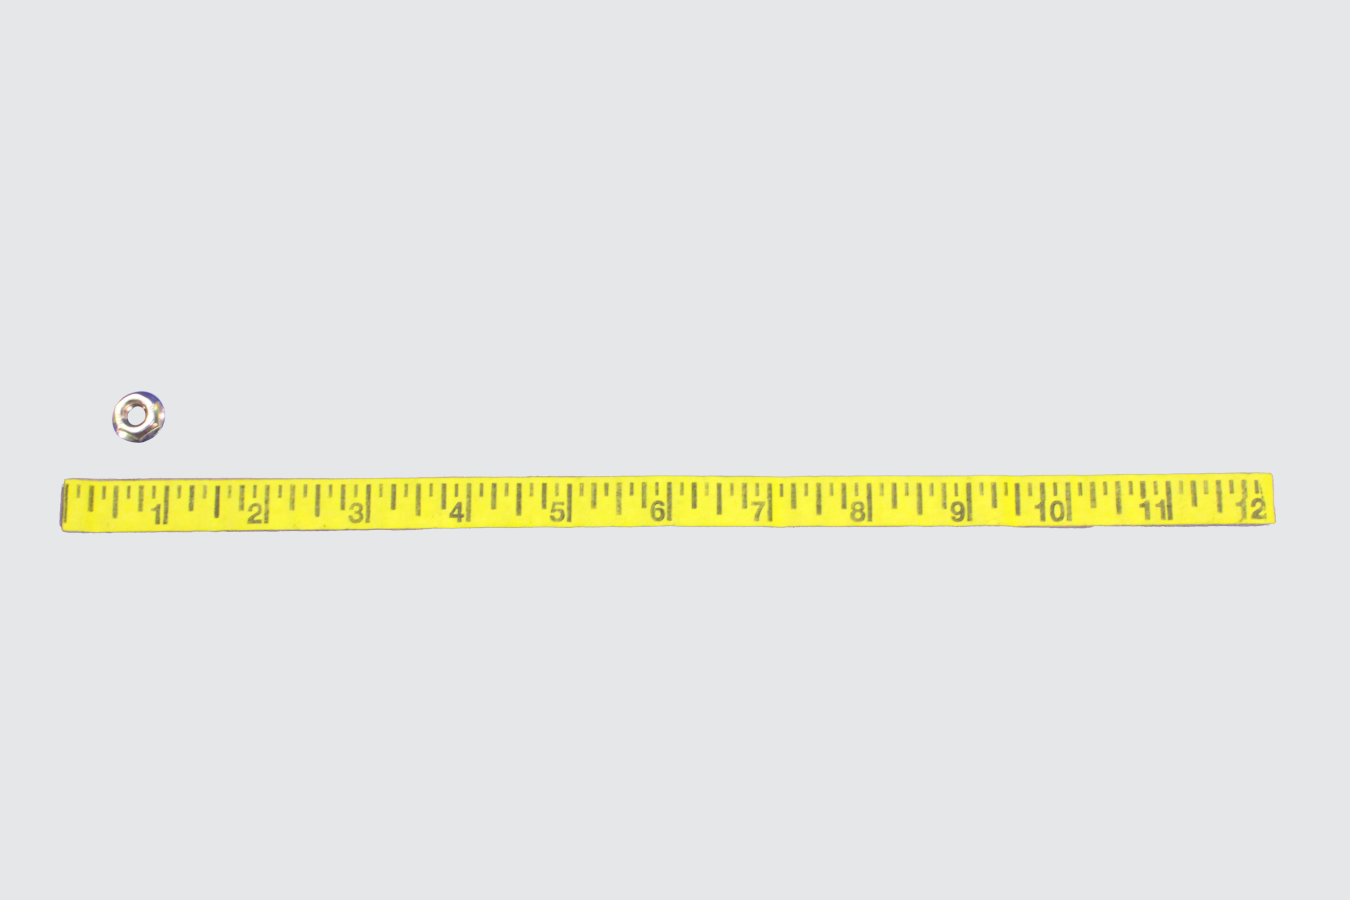 36898104-NUT, M6-1.0 HEX SERR FLANGE PROP CLASS 10 ZINC